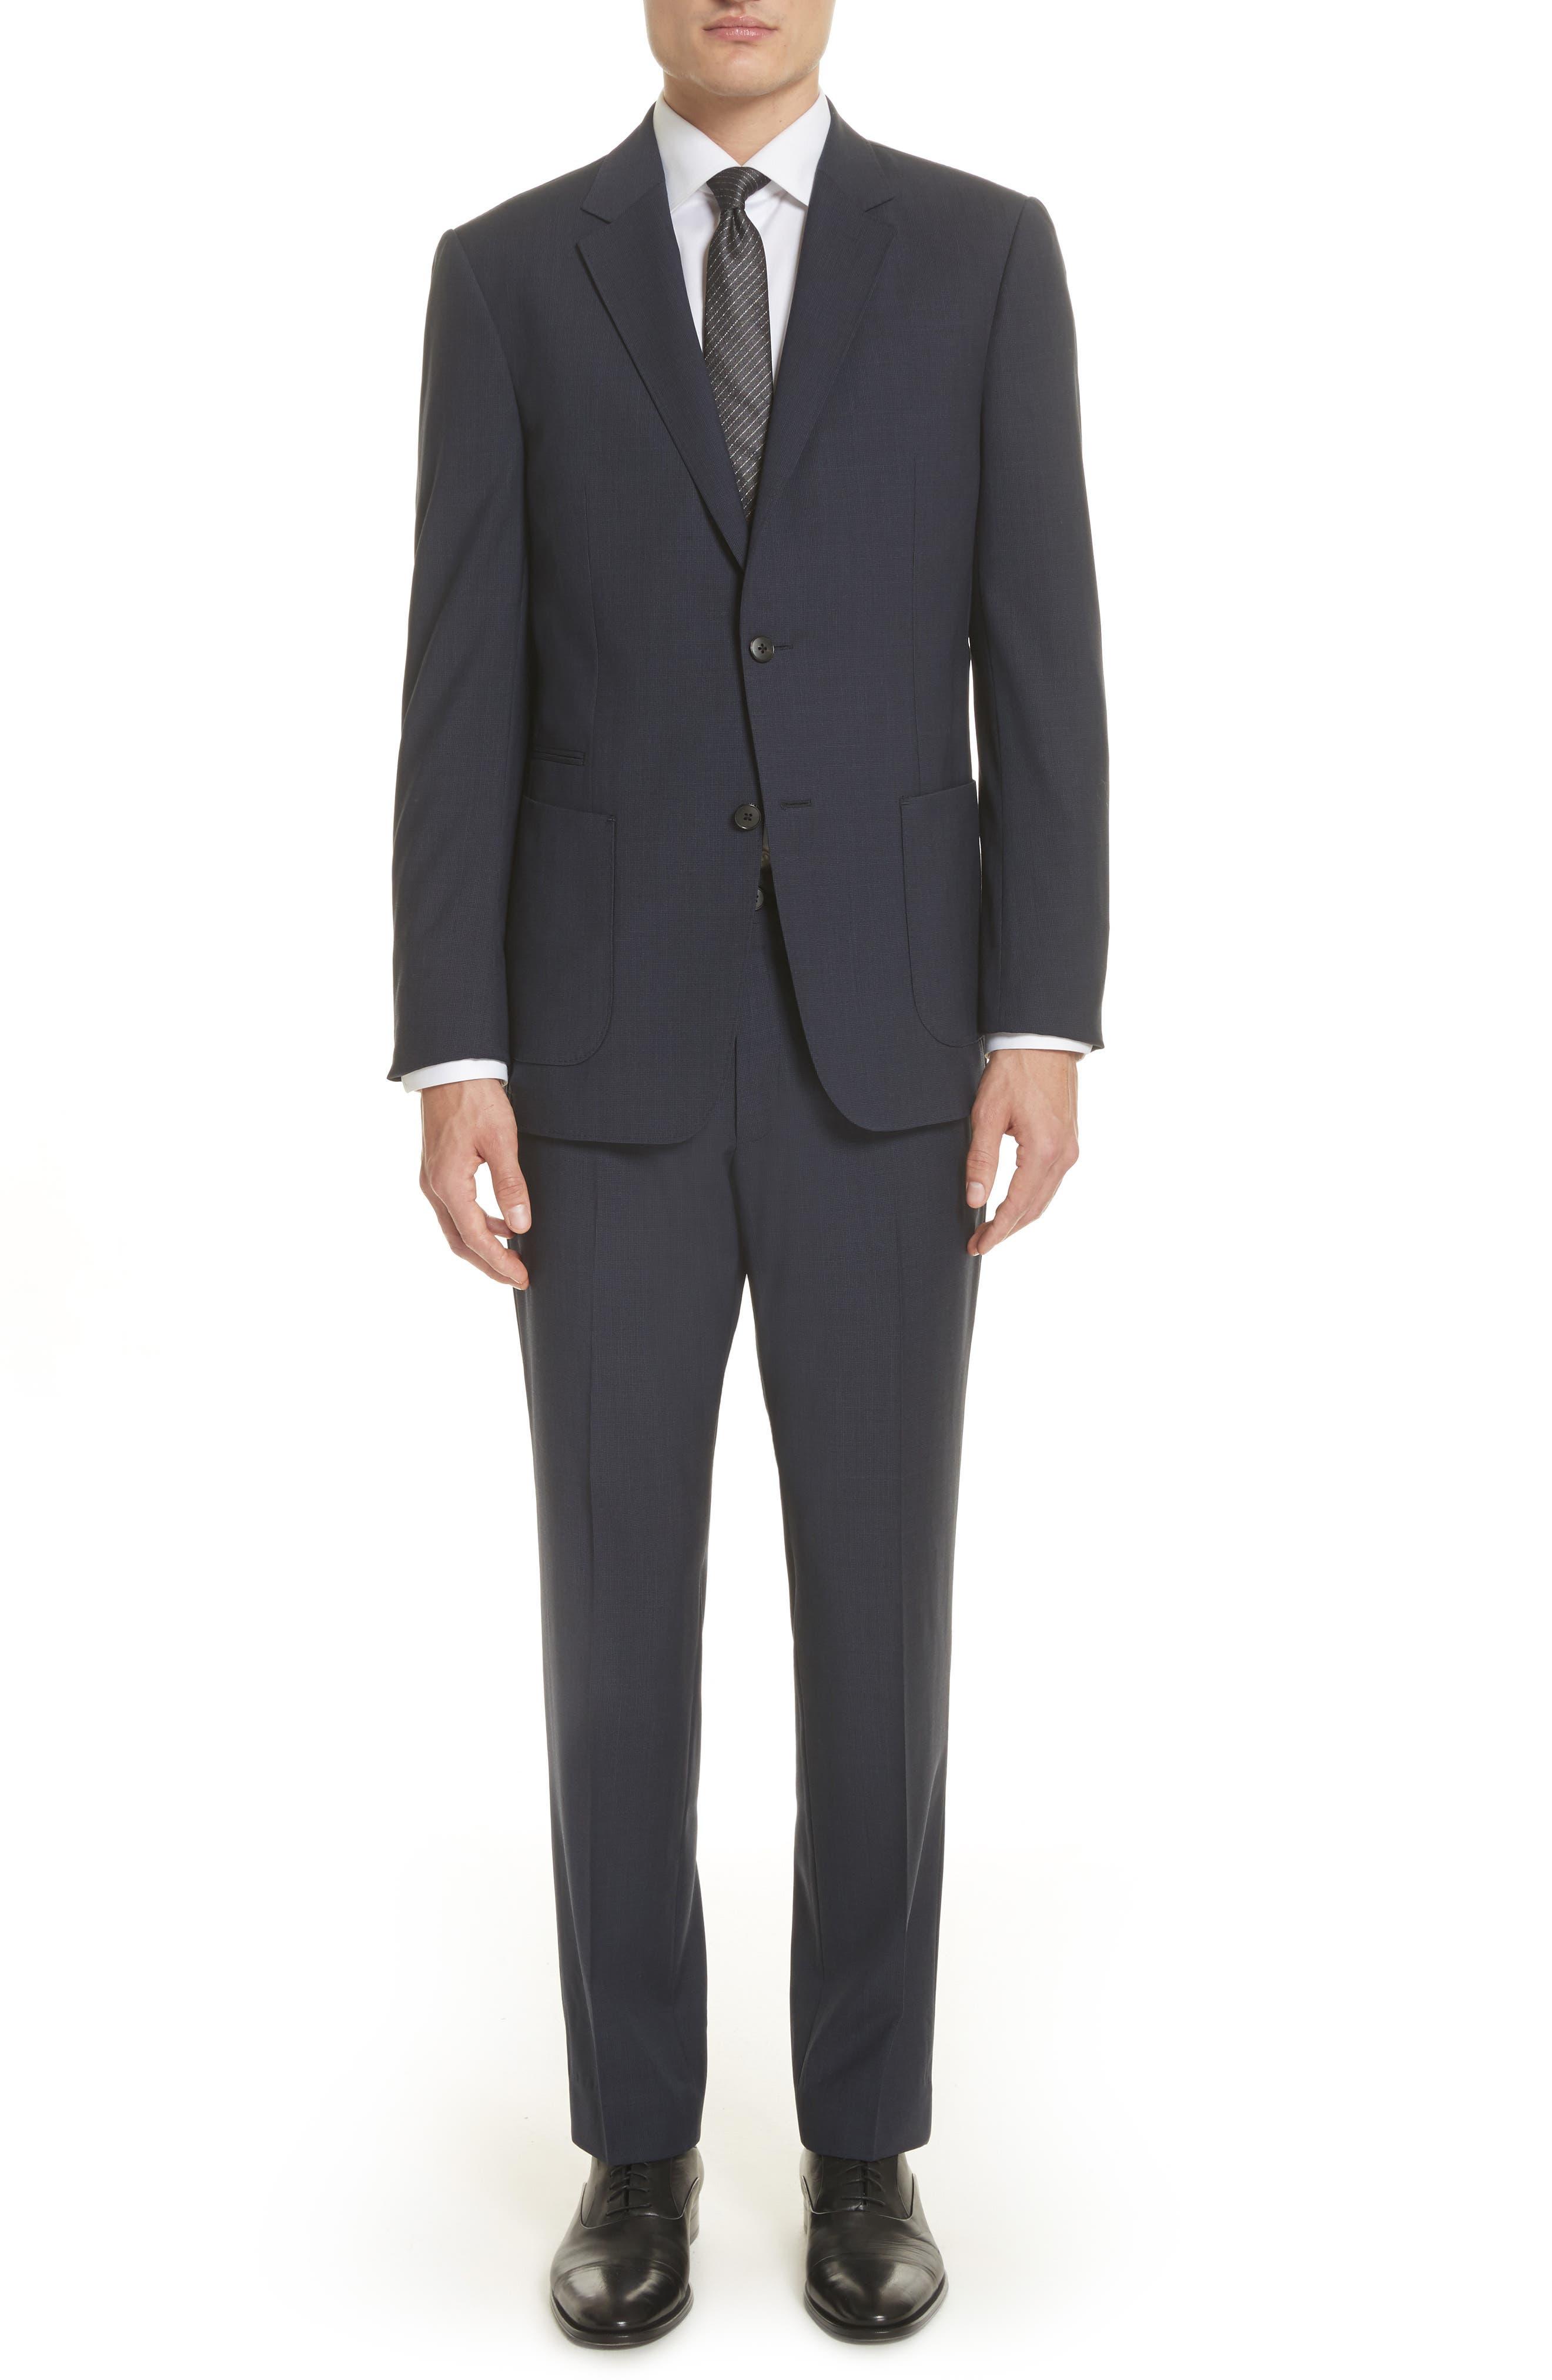 Z Zegna Techmerino™ Trim Fit Solid Wool Suit